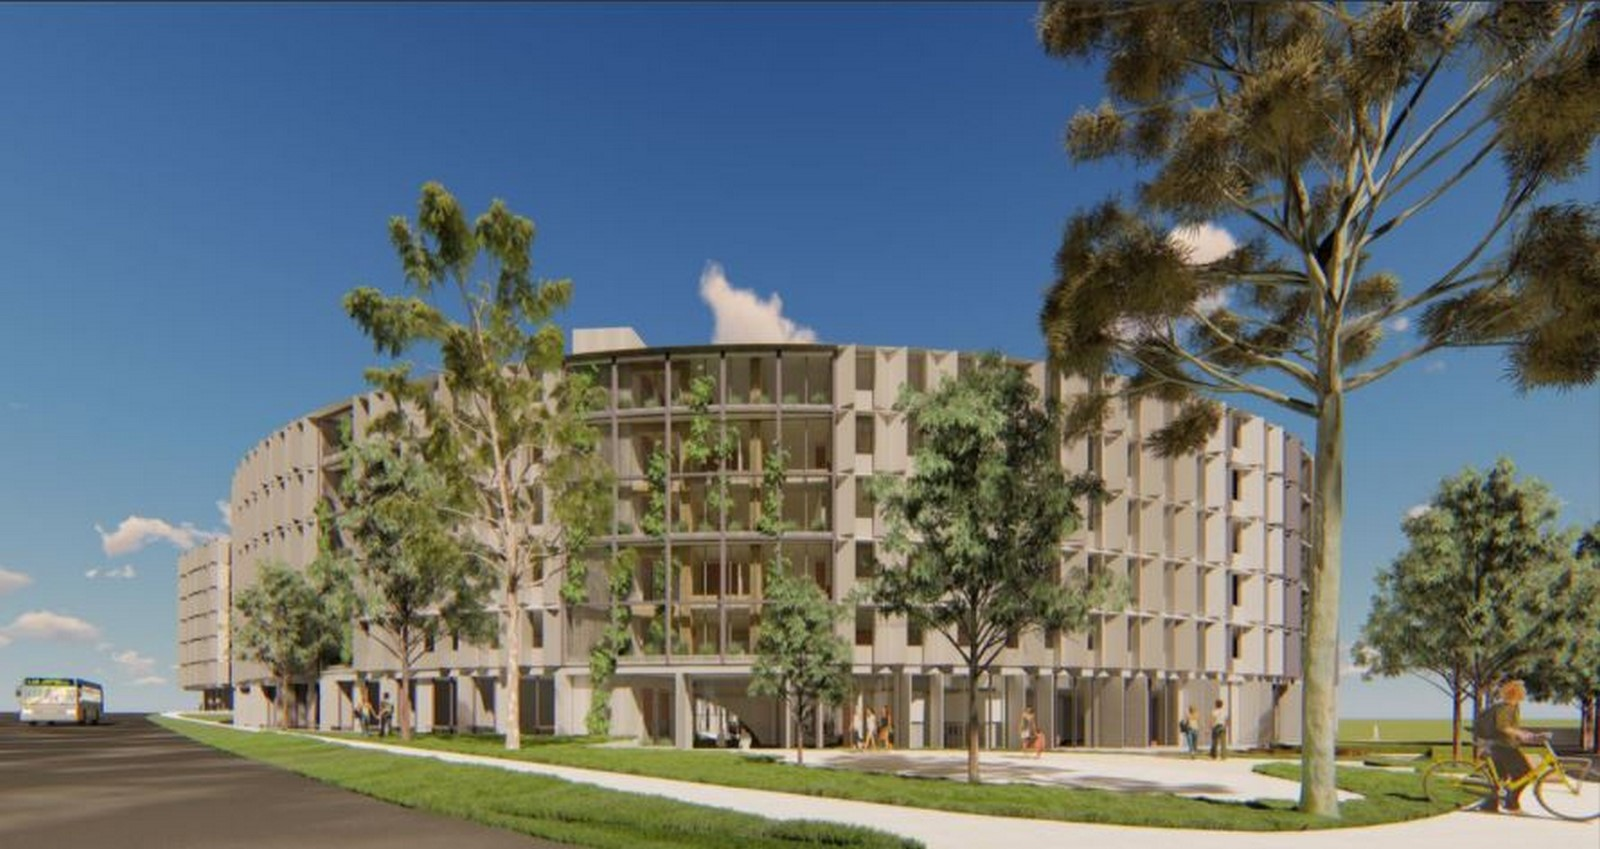 Student Accommodation by JCB Architects- Sheet1